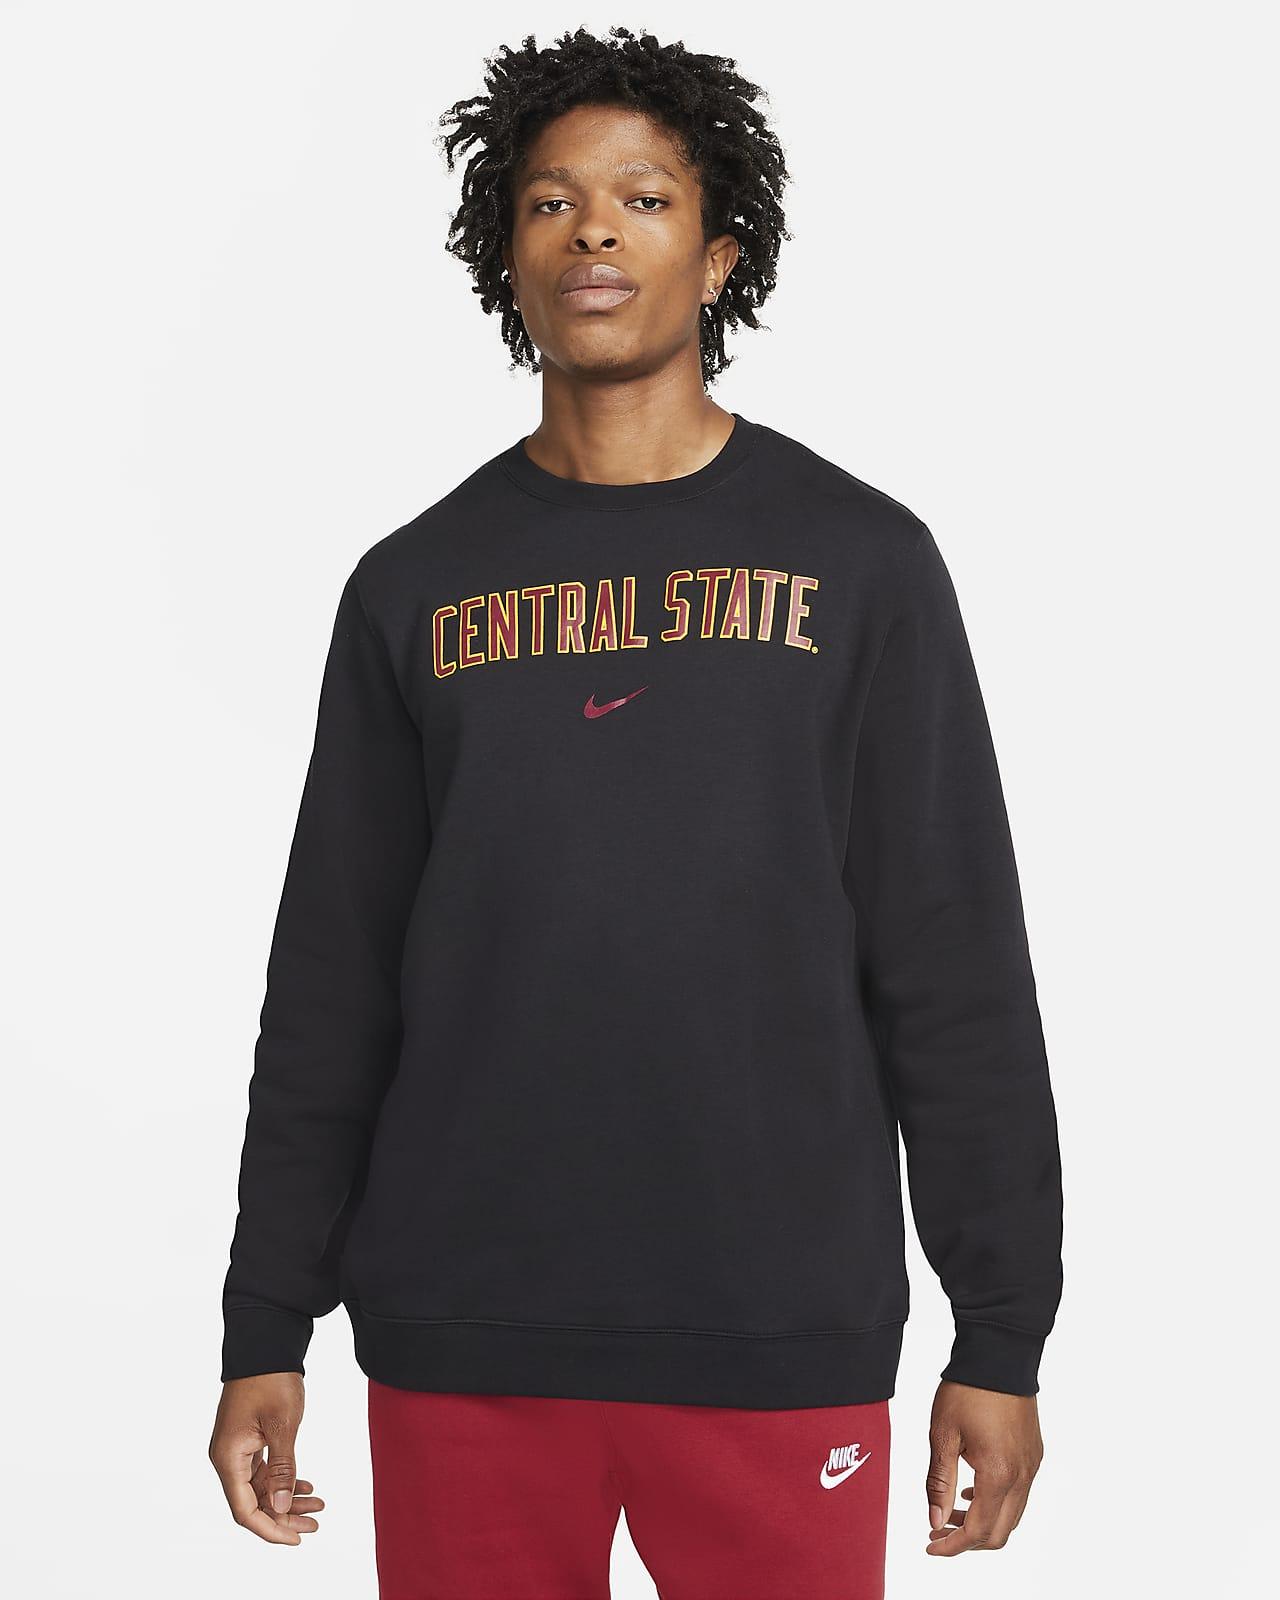 Nike College Club Fleece (Central State) Crew Sweatshirt